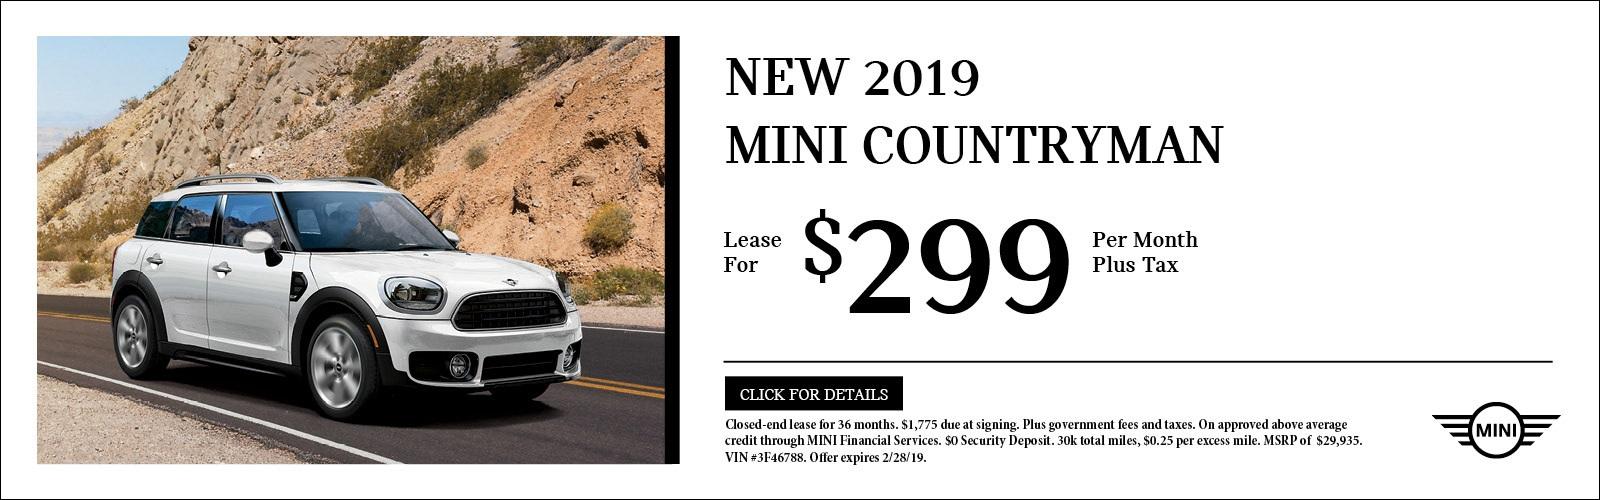 2019 Mini CountryMan